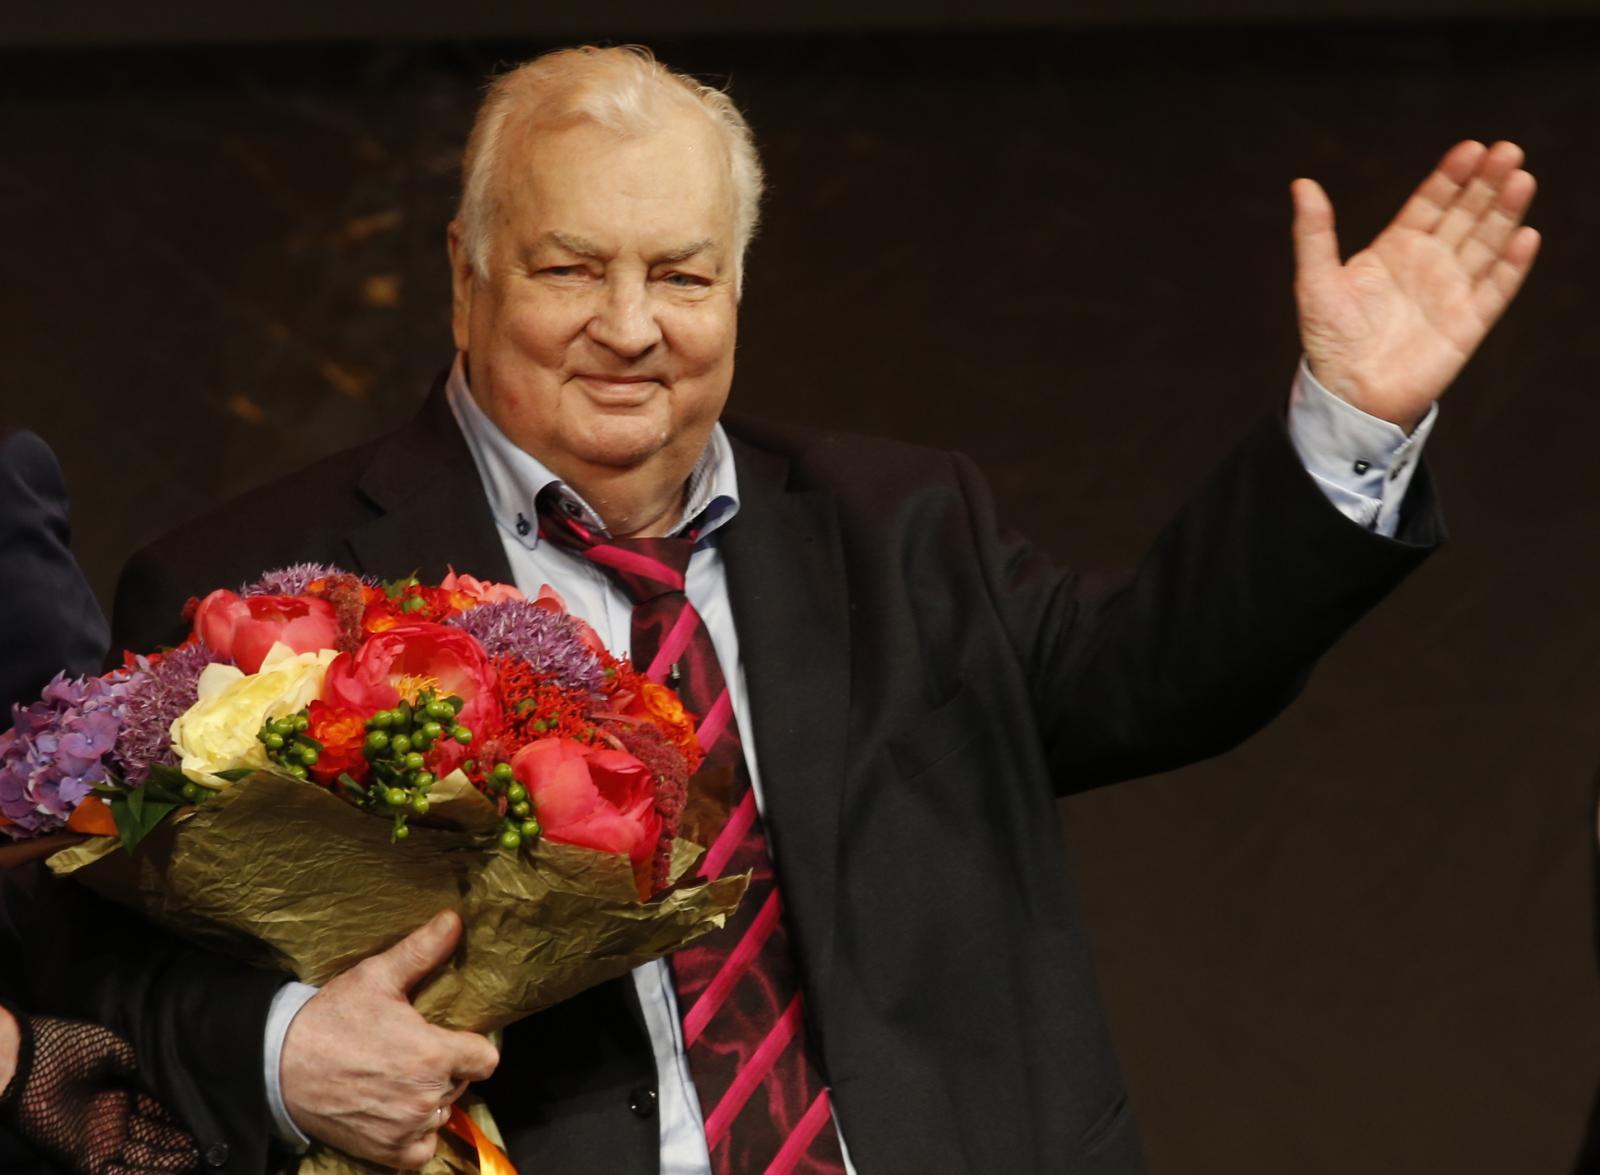 Умер народный артист Михаил Державин